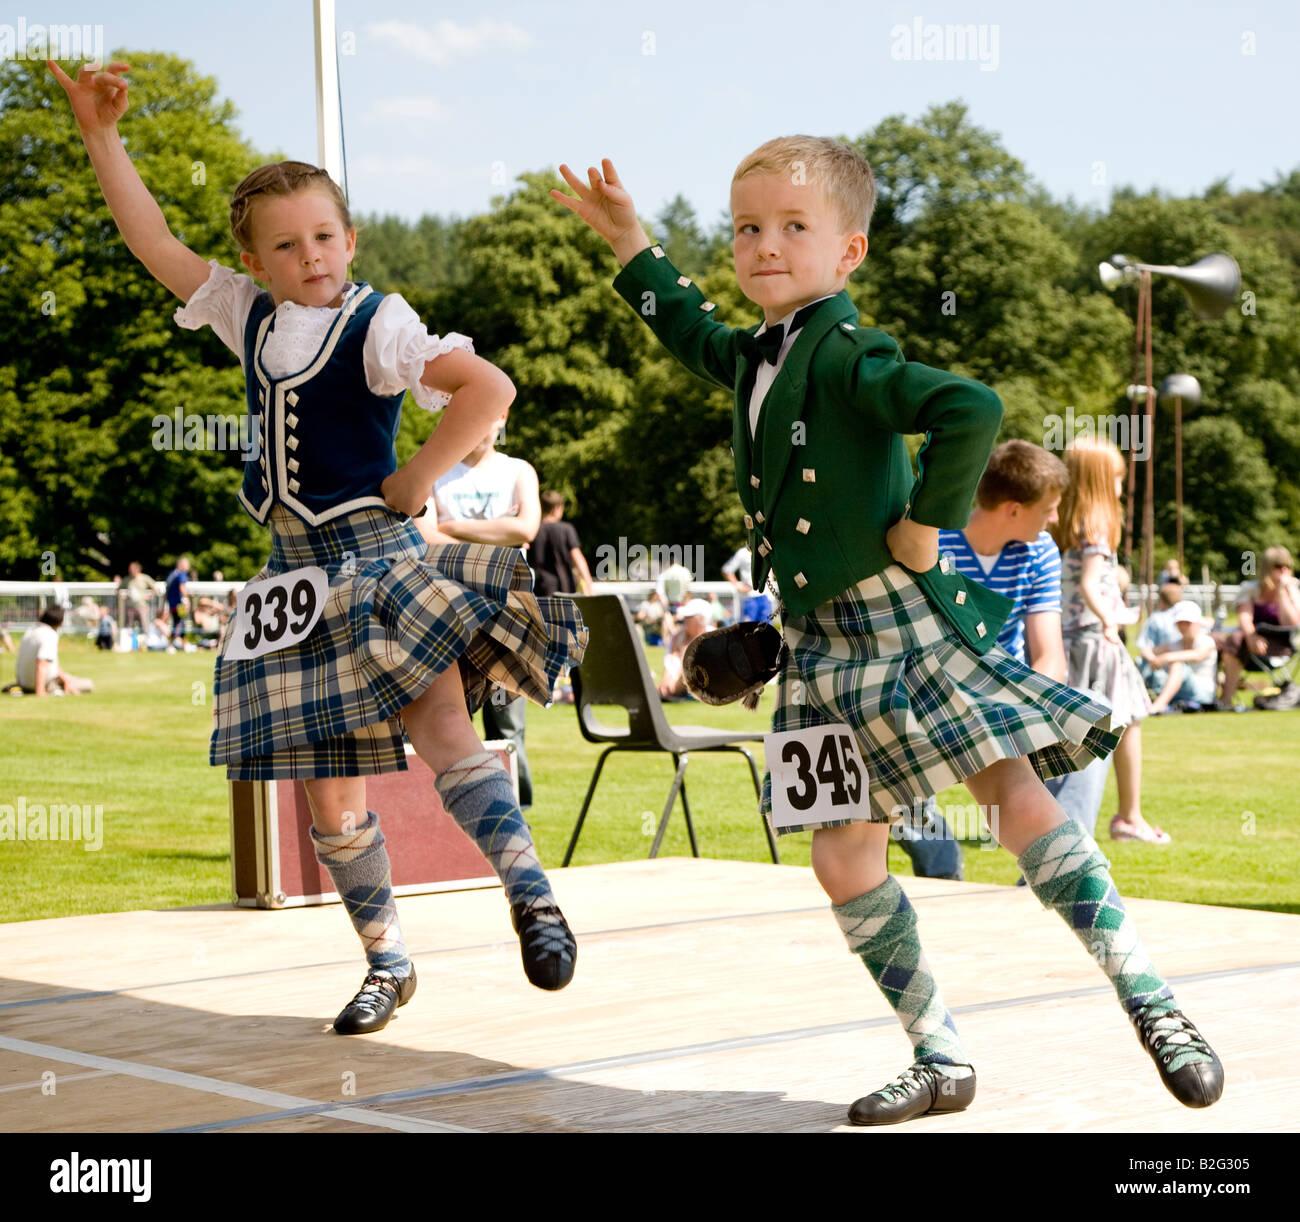 Kids Highland Dancing Shoes